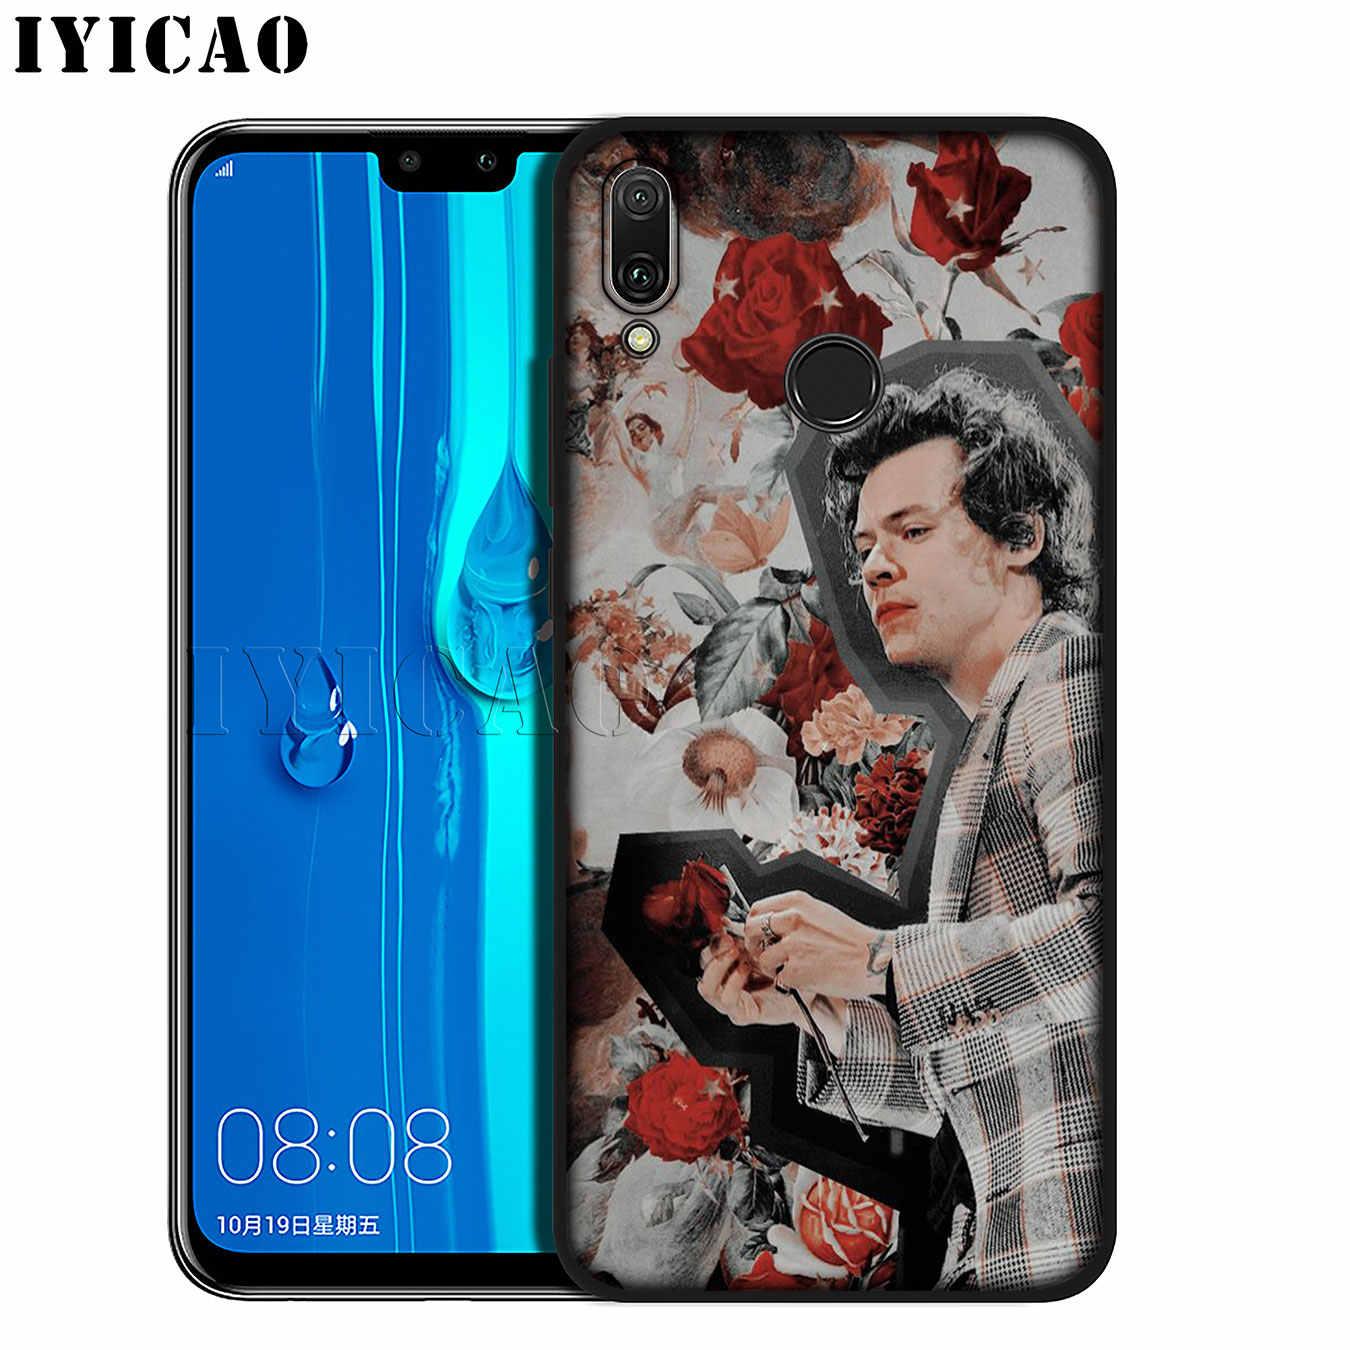 IYICAO 一方向入れ墨ハリースタイルソフトシリコン電話ケース huawei 社メイト 30 20 10 プロ Lite ノヴァ 5I 4 3i 3 2i Lite